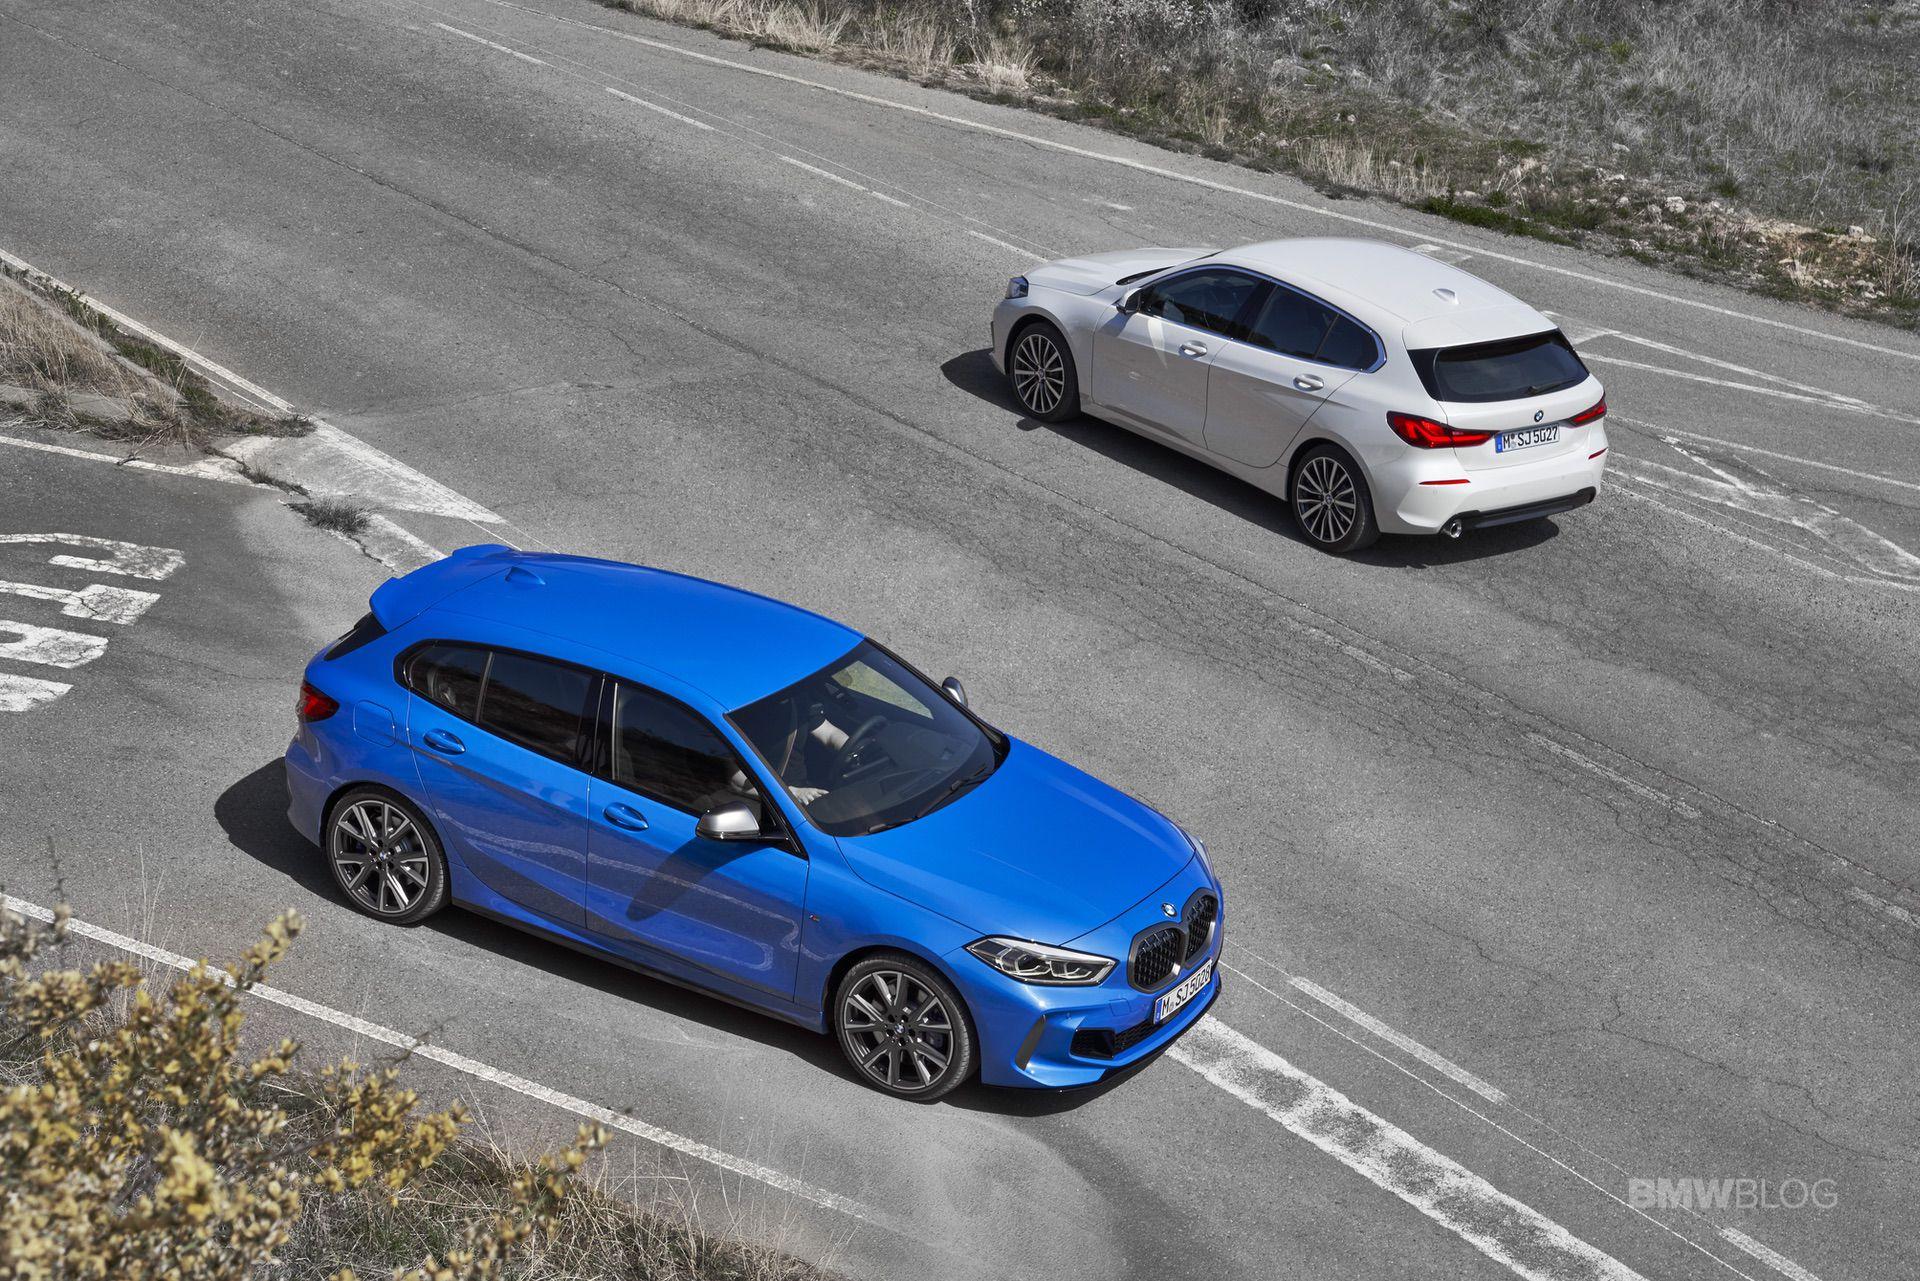 new 2019 BMW 1 Series photos 01